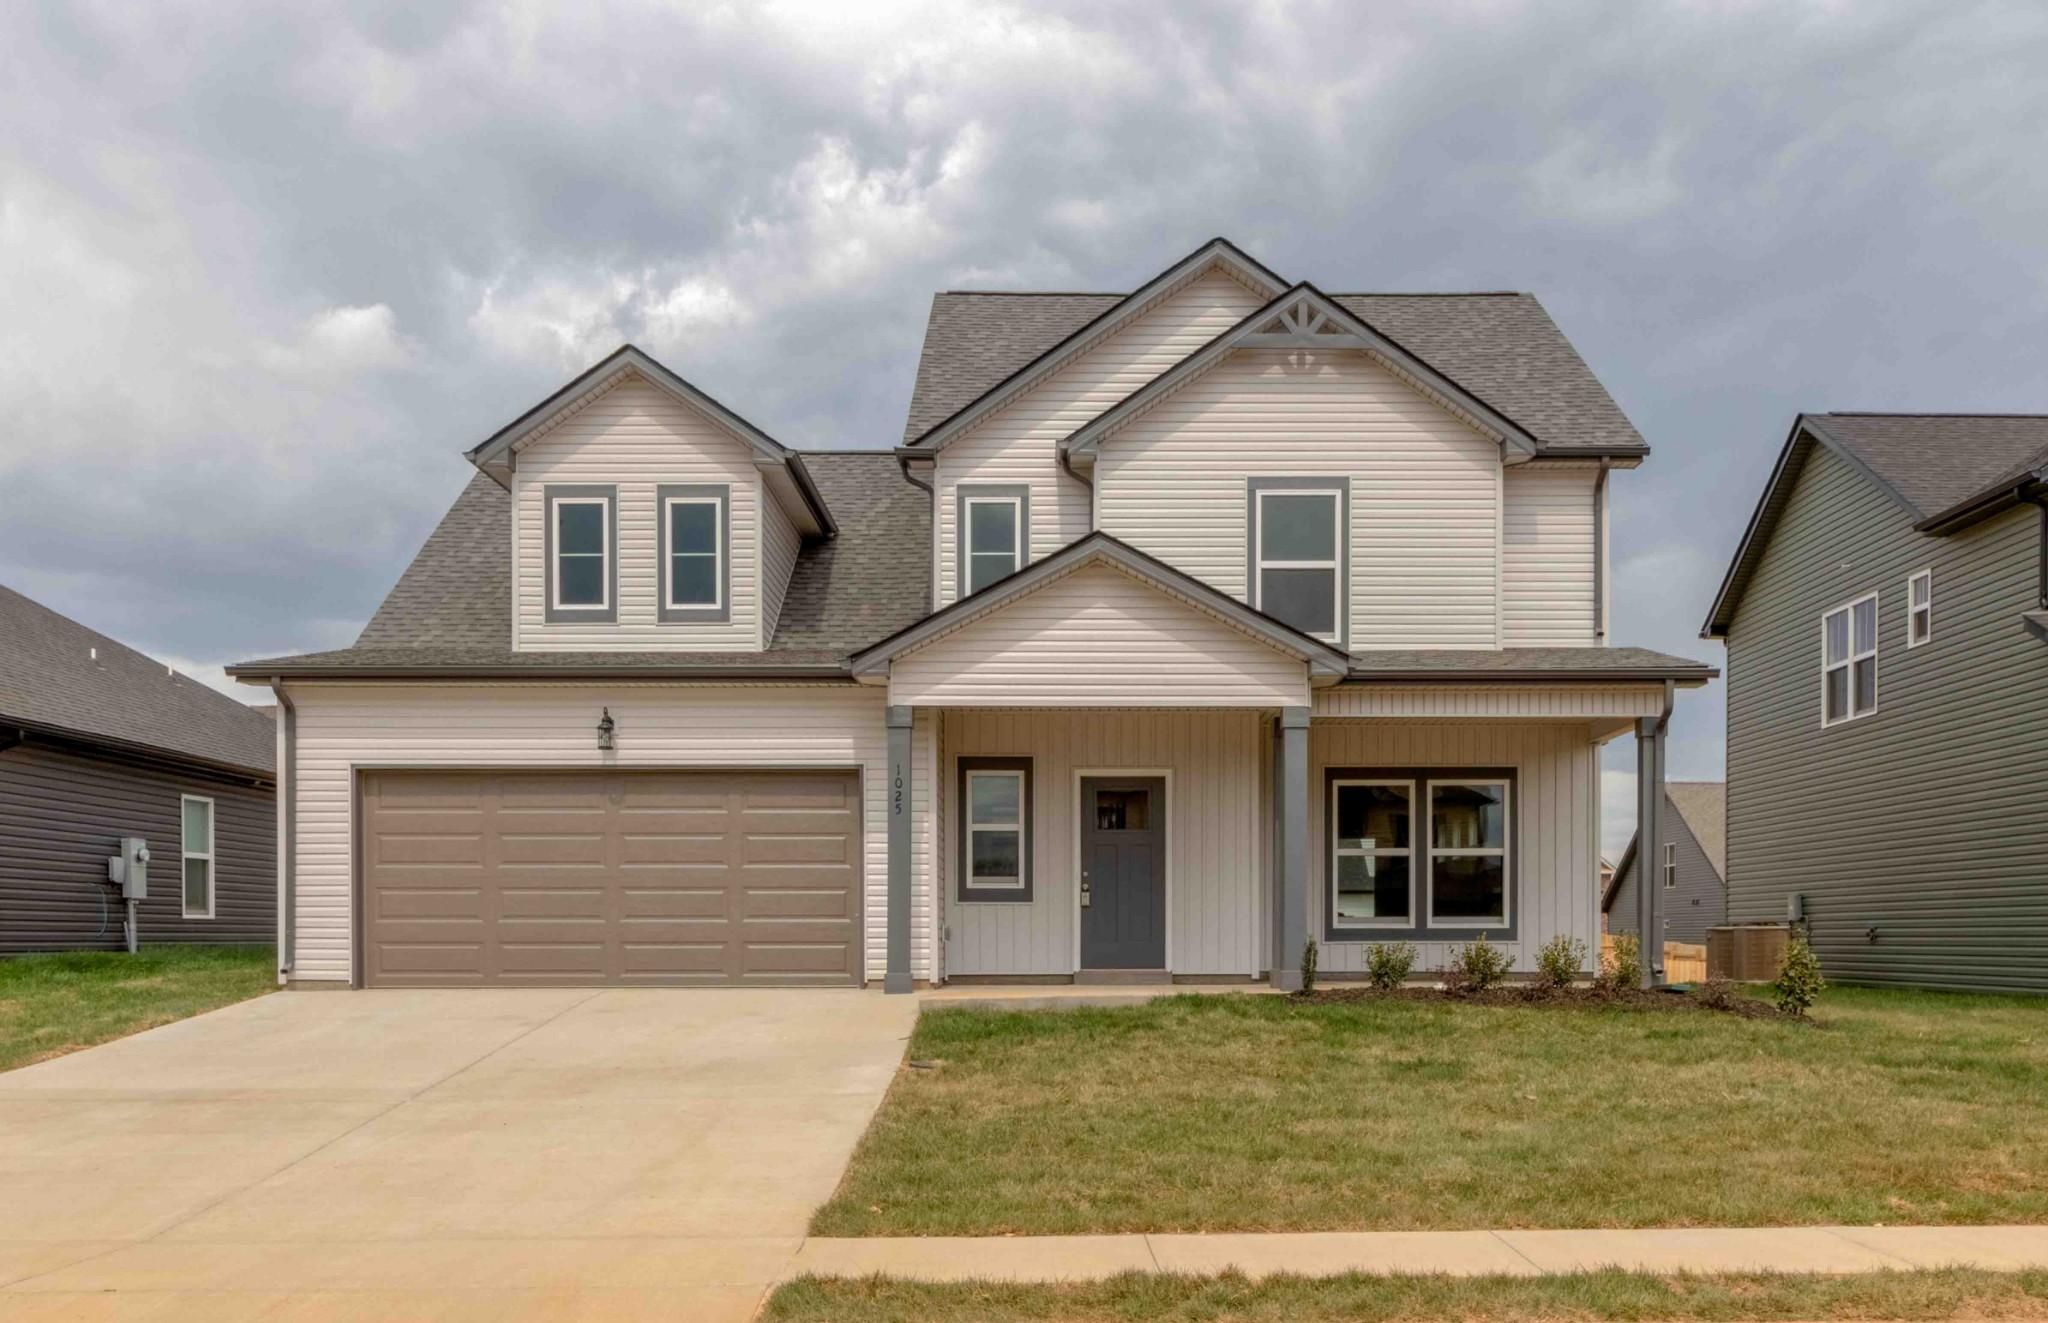 1025 Spicer Dr Property Photo - Clarksville, TN real estate listing